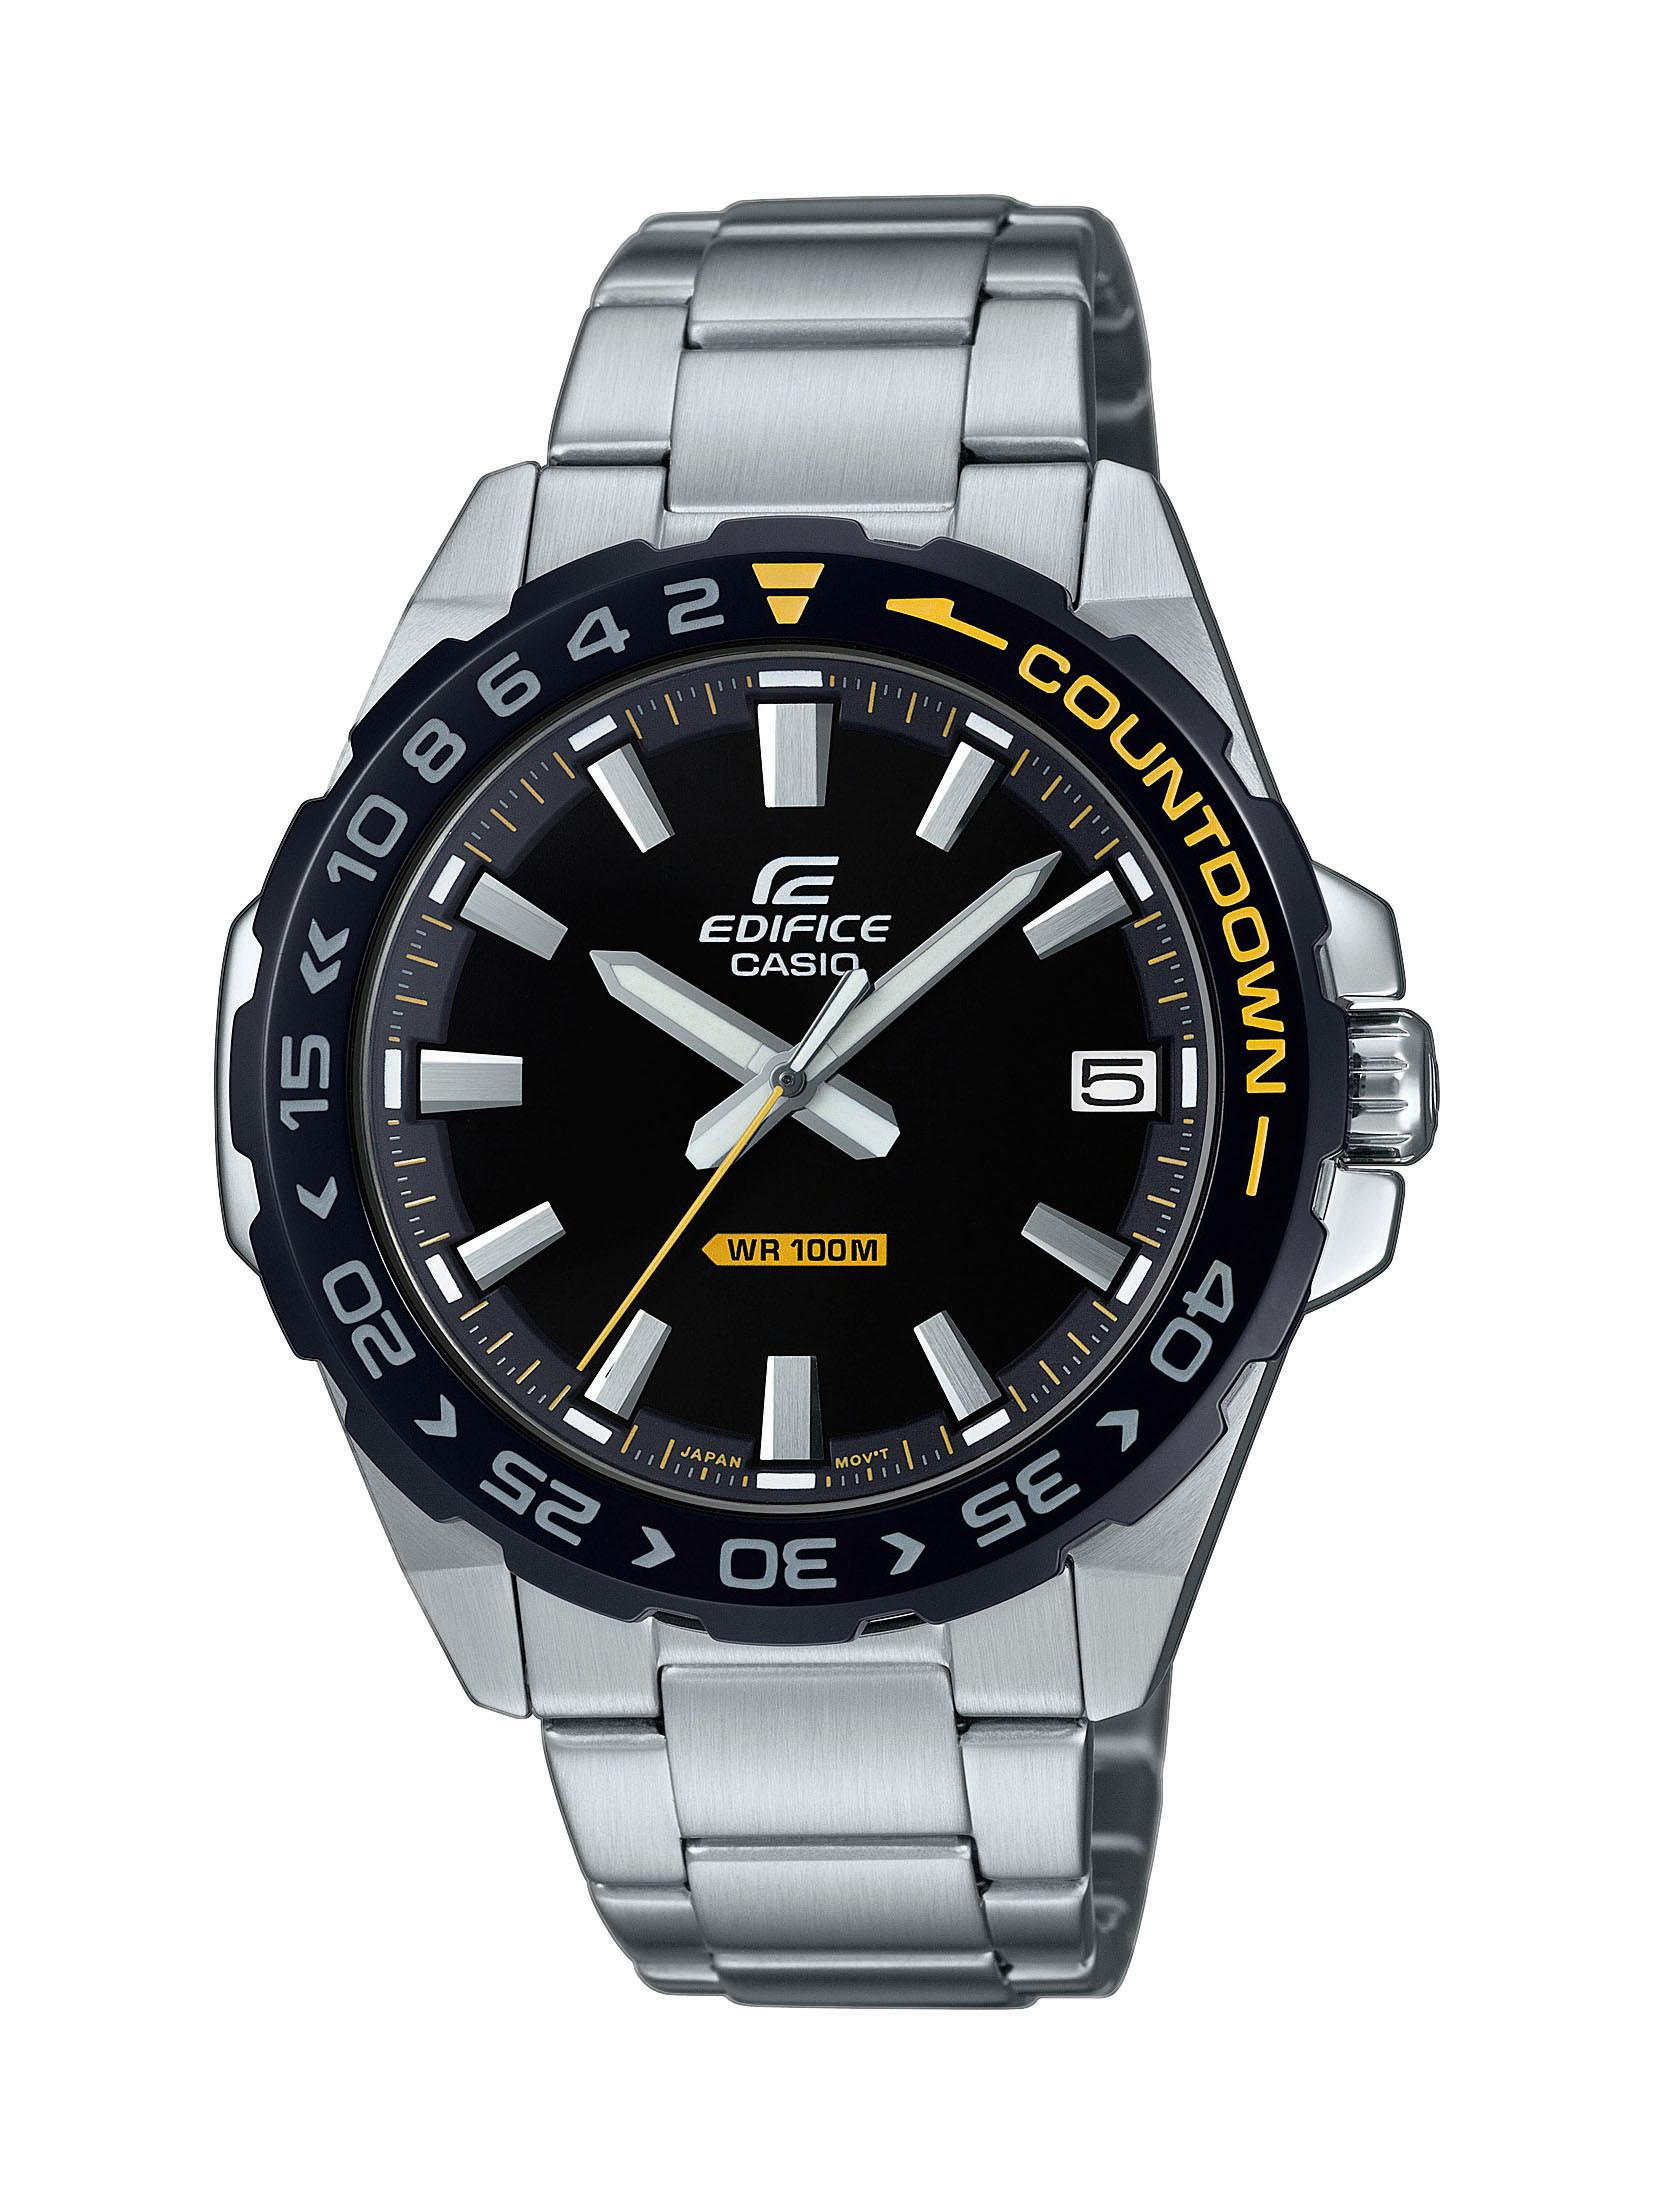 CASIO Edifice Classic EFV-120DB-1AVUEF